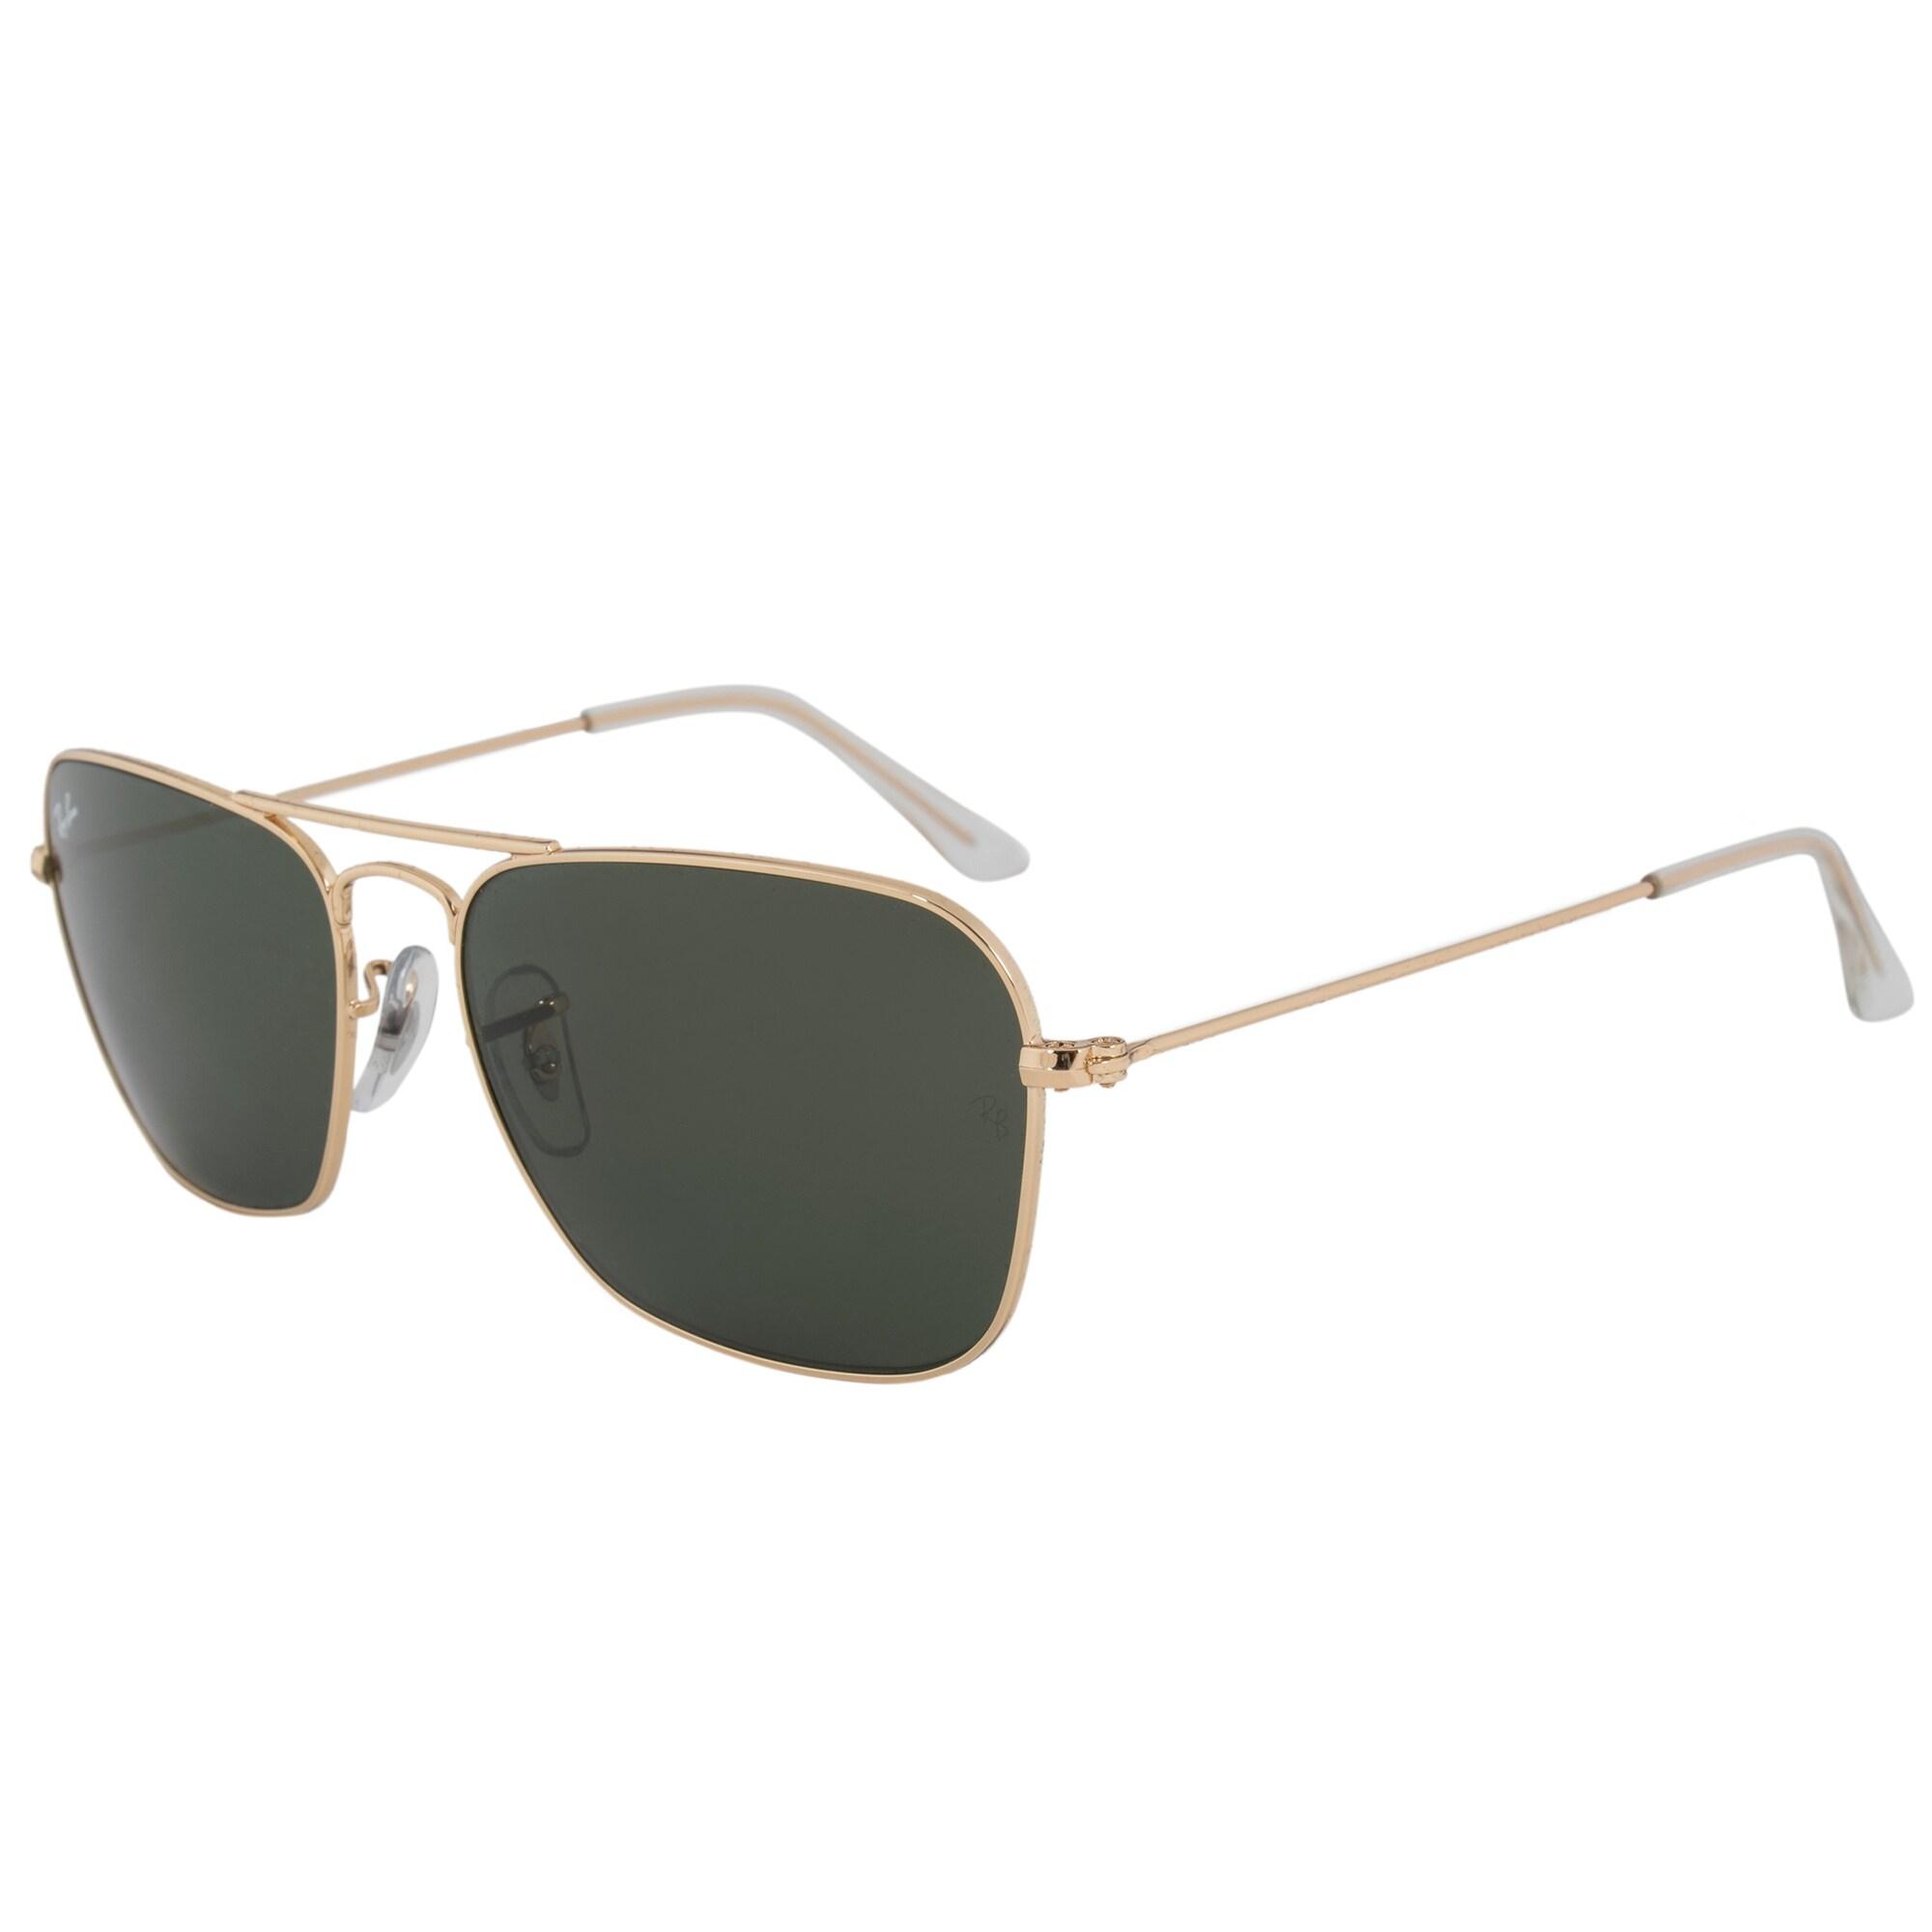 90e5e8de6e Shop Ray-Ban Caravan Sunglasses RB3136 001 55